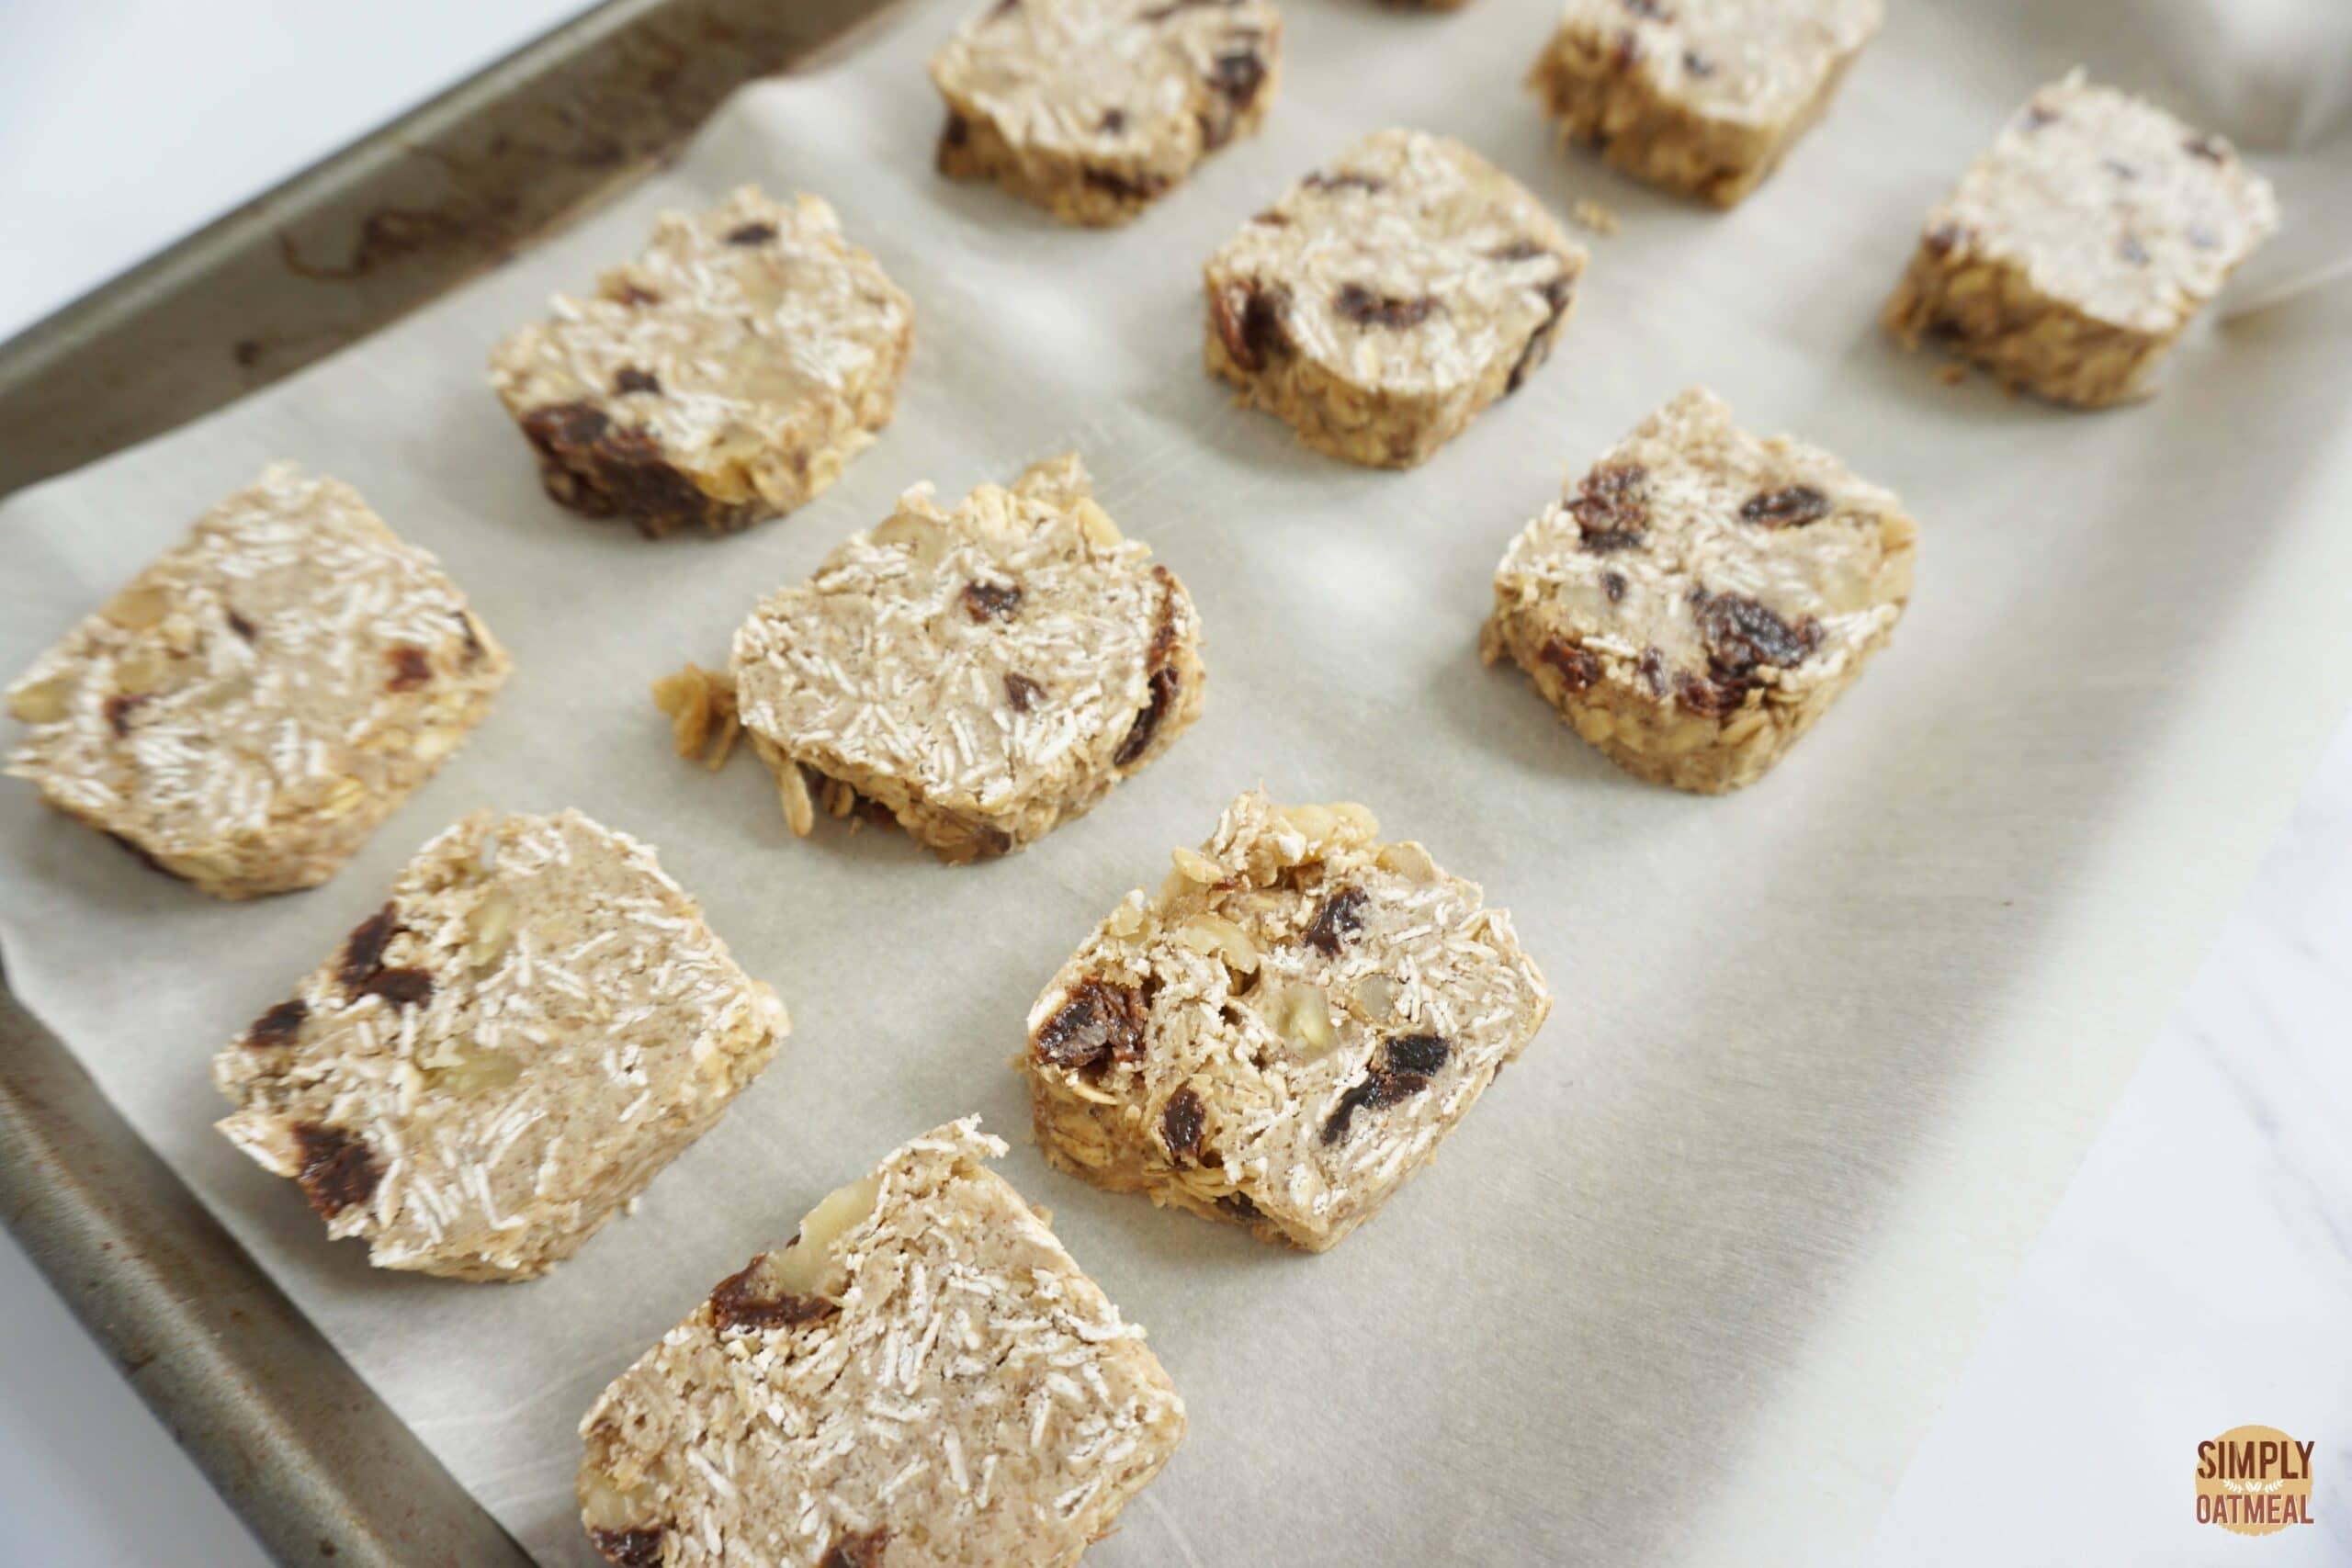 Raw carrot cake oatmeal cookies on baking sheet.